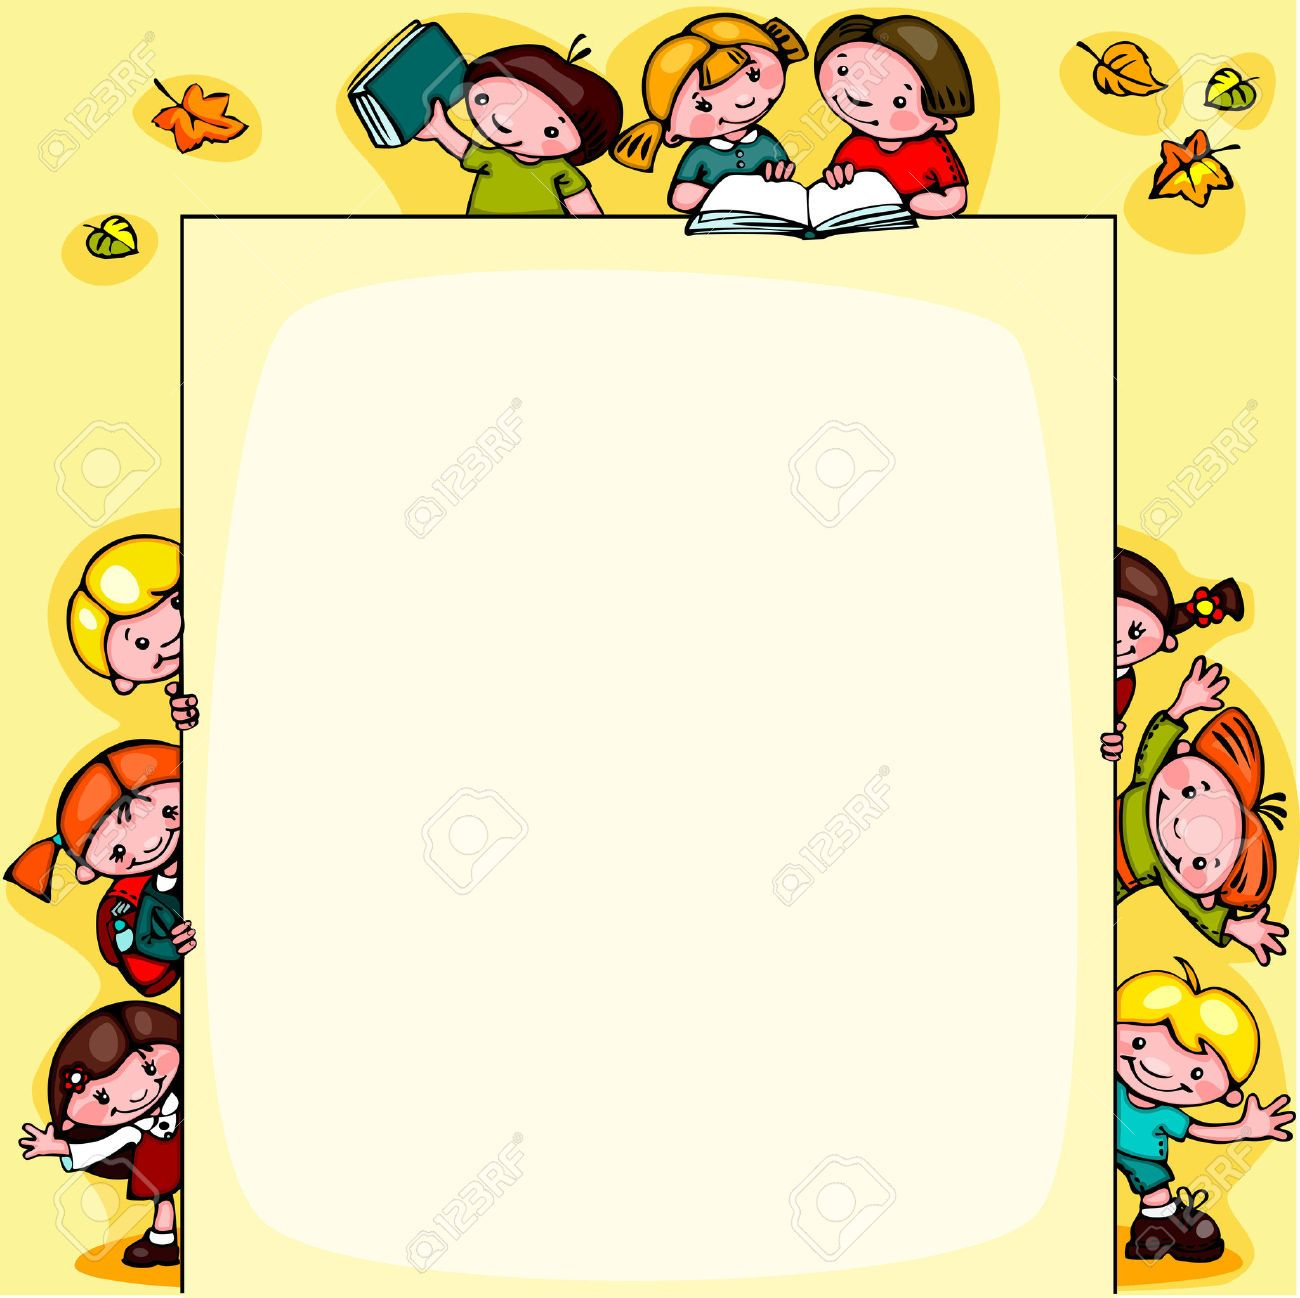 school frames and borders - Google Search | doku1 | Pinterest ...